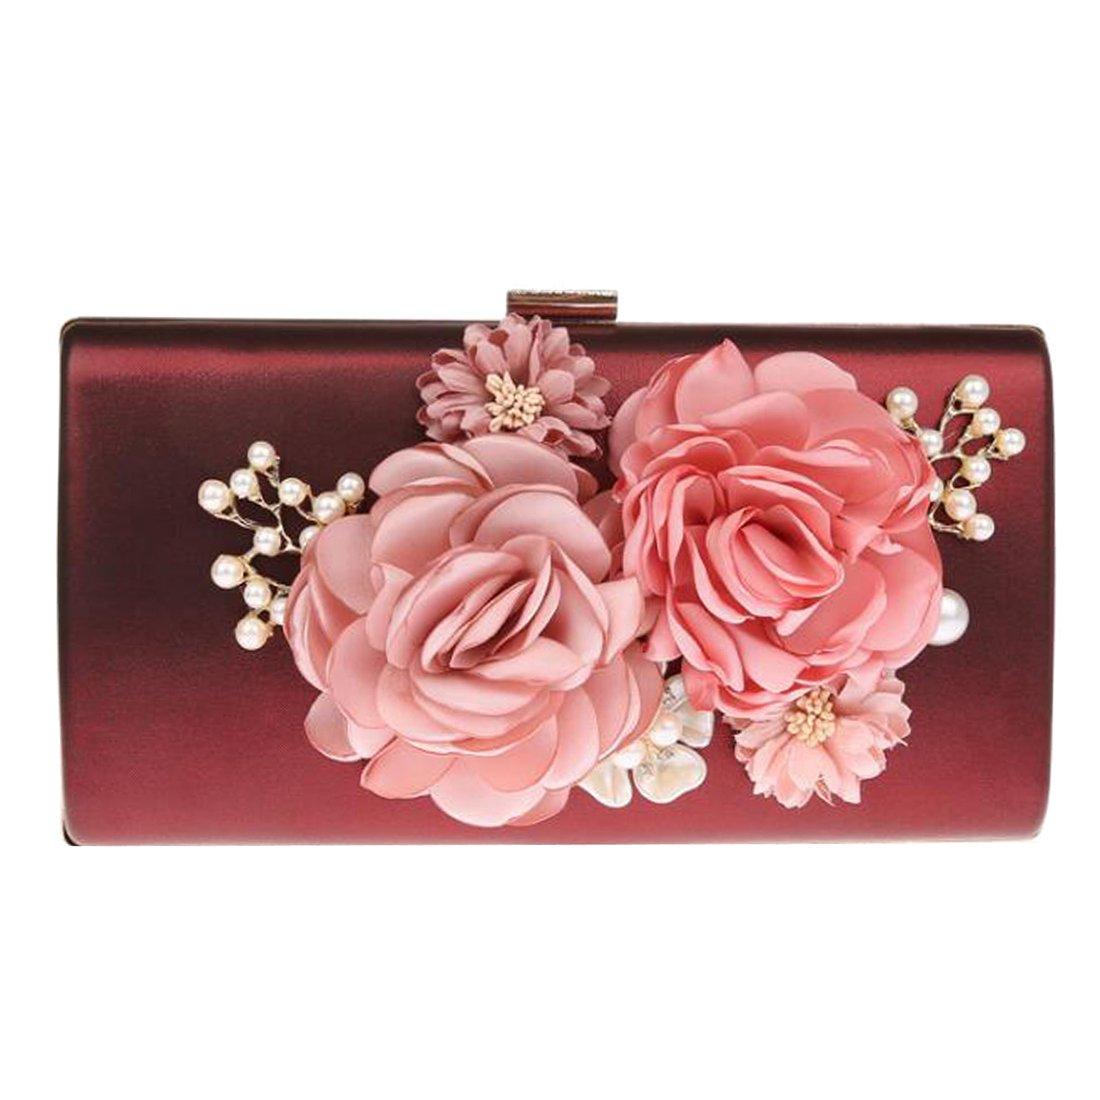 EPLAZA Women Large Capacity Flora Evening Party Bags Clutch Purse Vintage Wedding Handbags Wallet (burgundy)